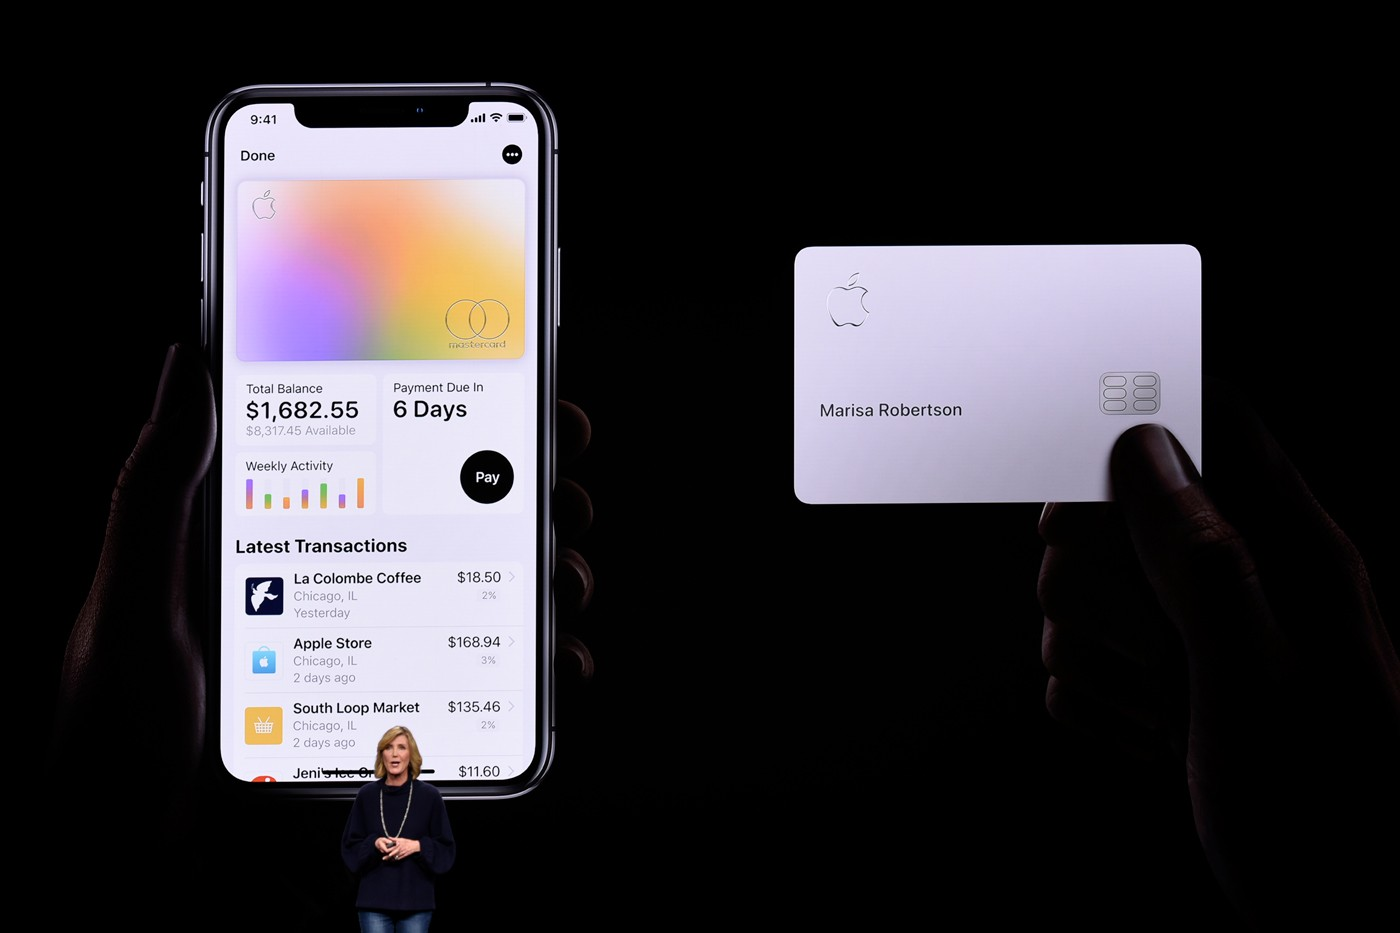 https___hypebeast.com_image_2019_08_goldman-sachs-publishes-apple-card-customer-agreement-001.jpg